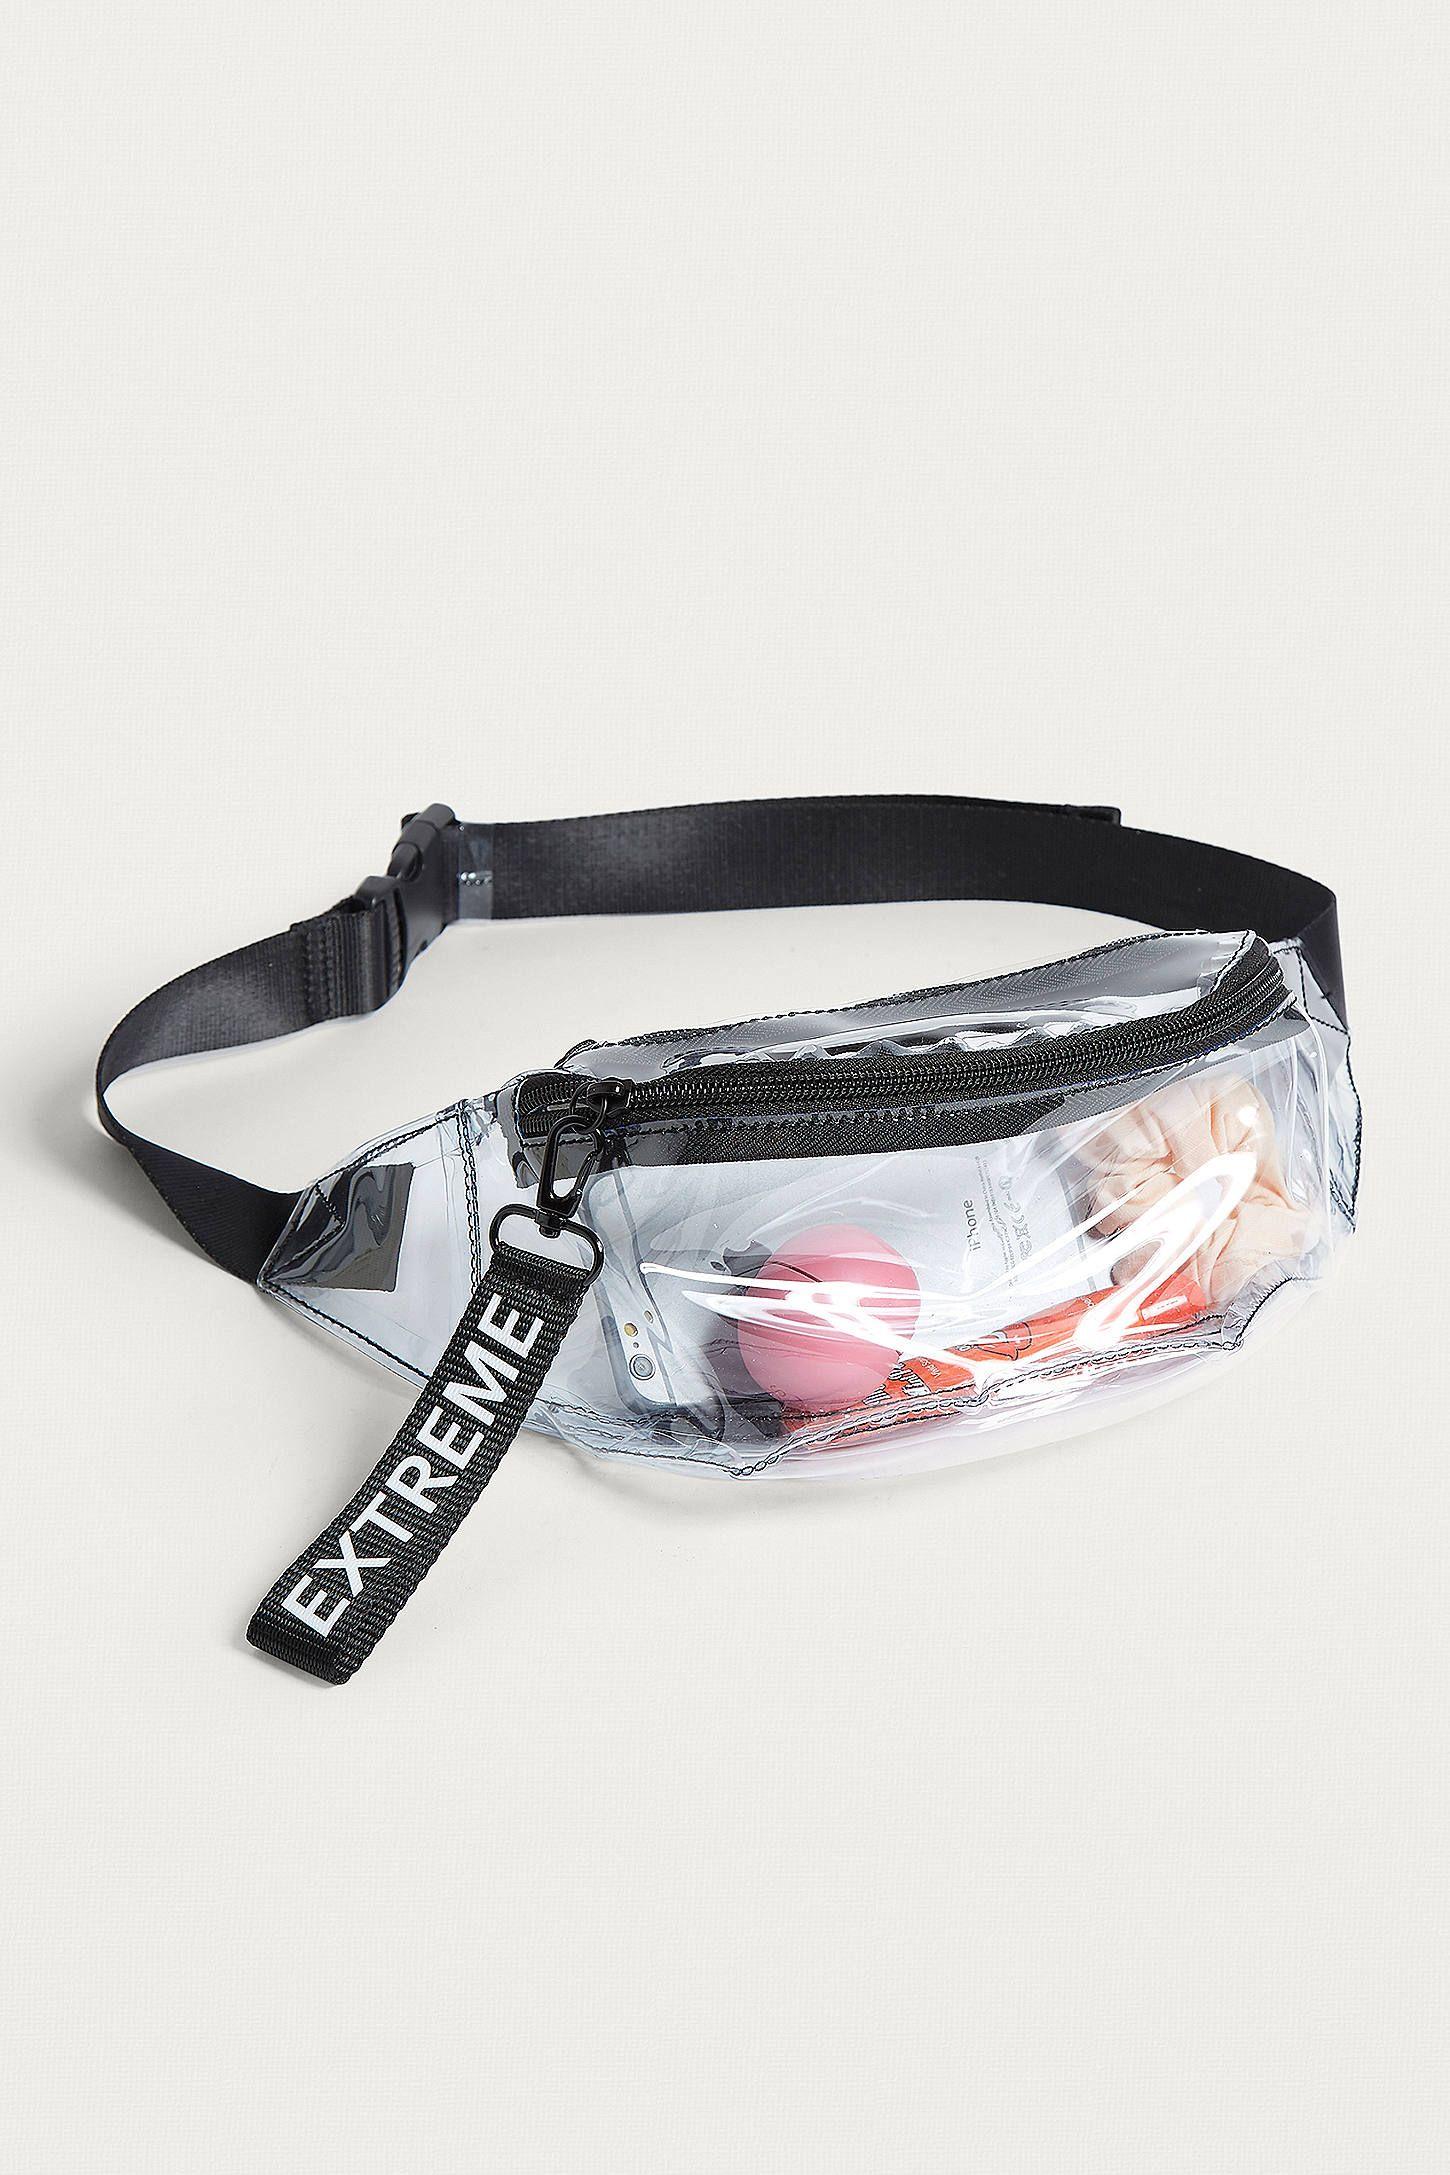 Summer Bag PVC Clear Waist Waterproof Jelly Belt Transparent Casual Fanny Pack